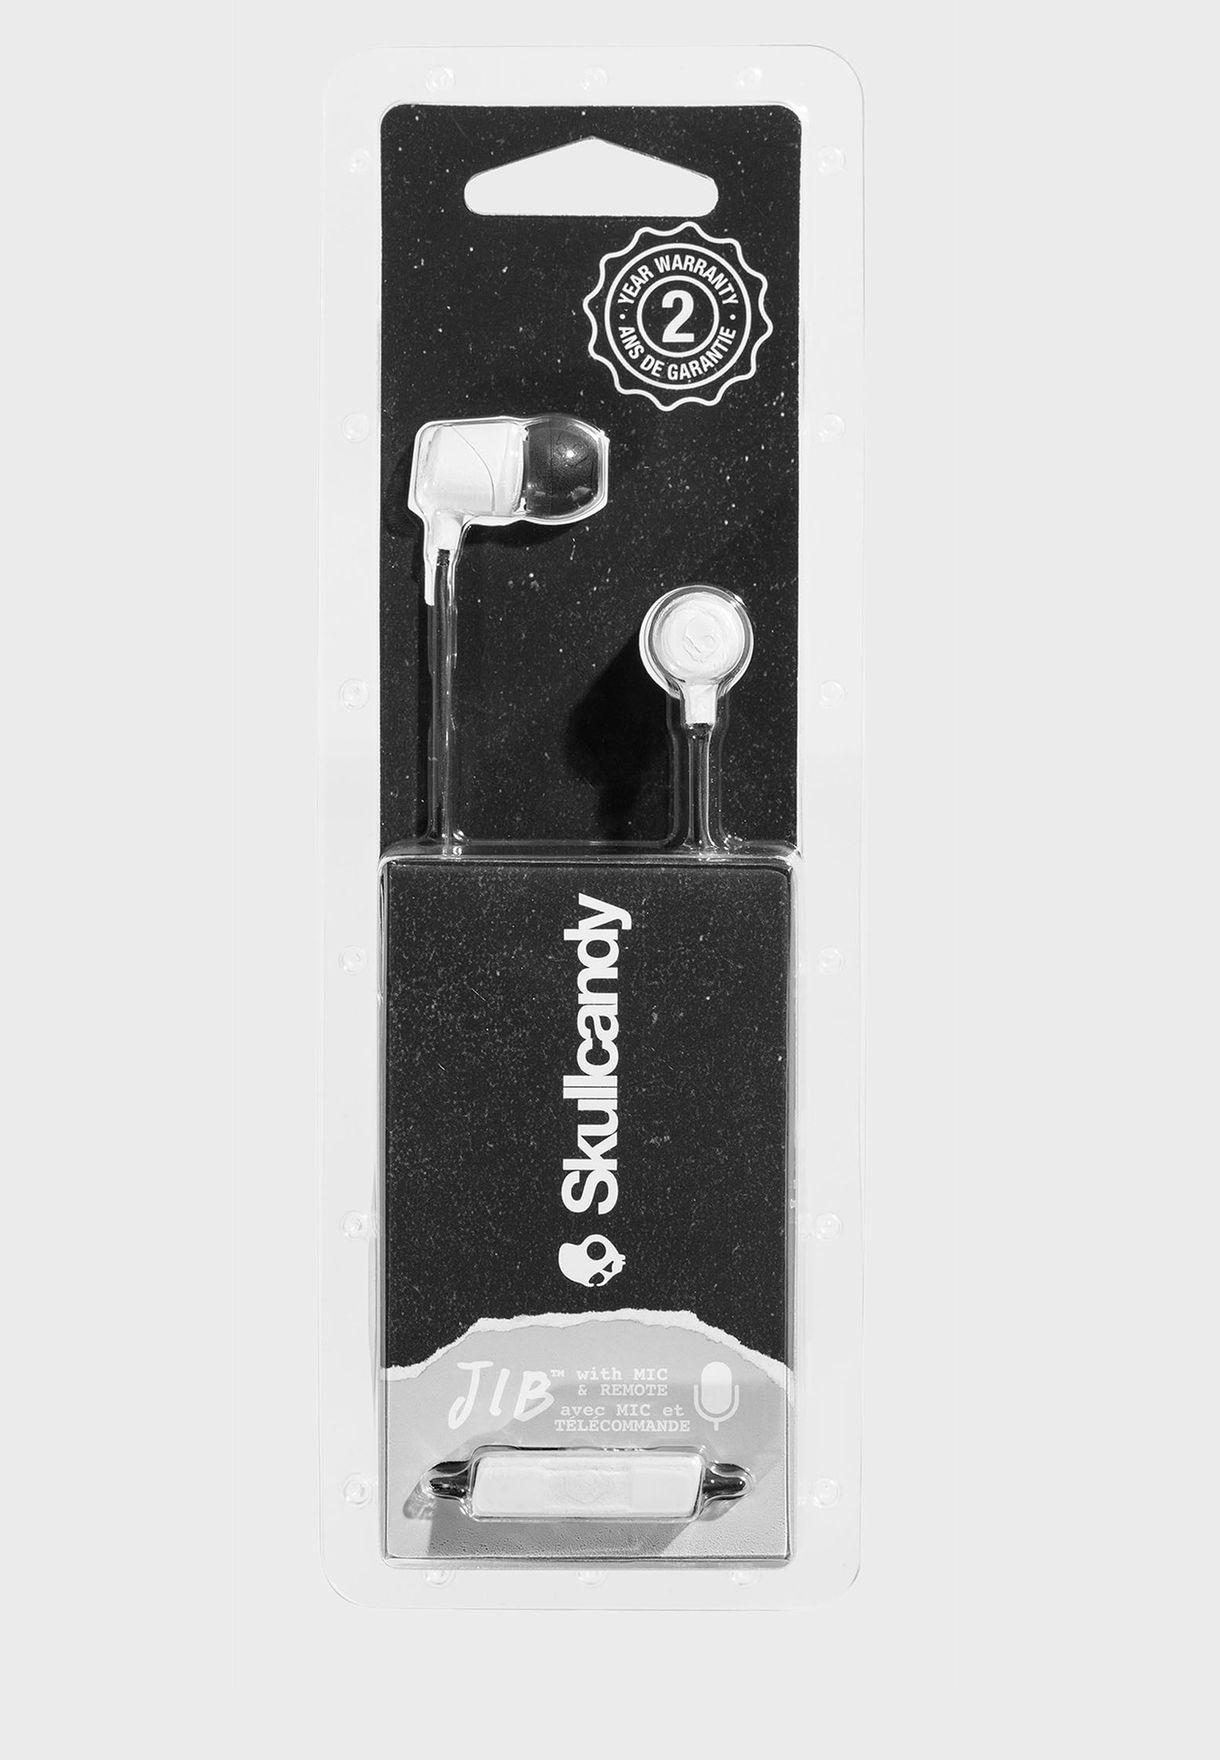 Jib In-Ear Earphones With Microphone